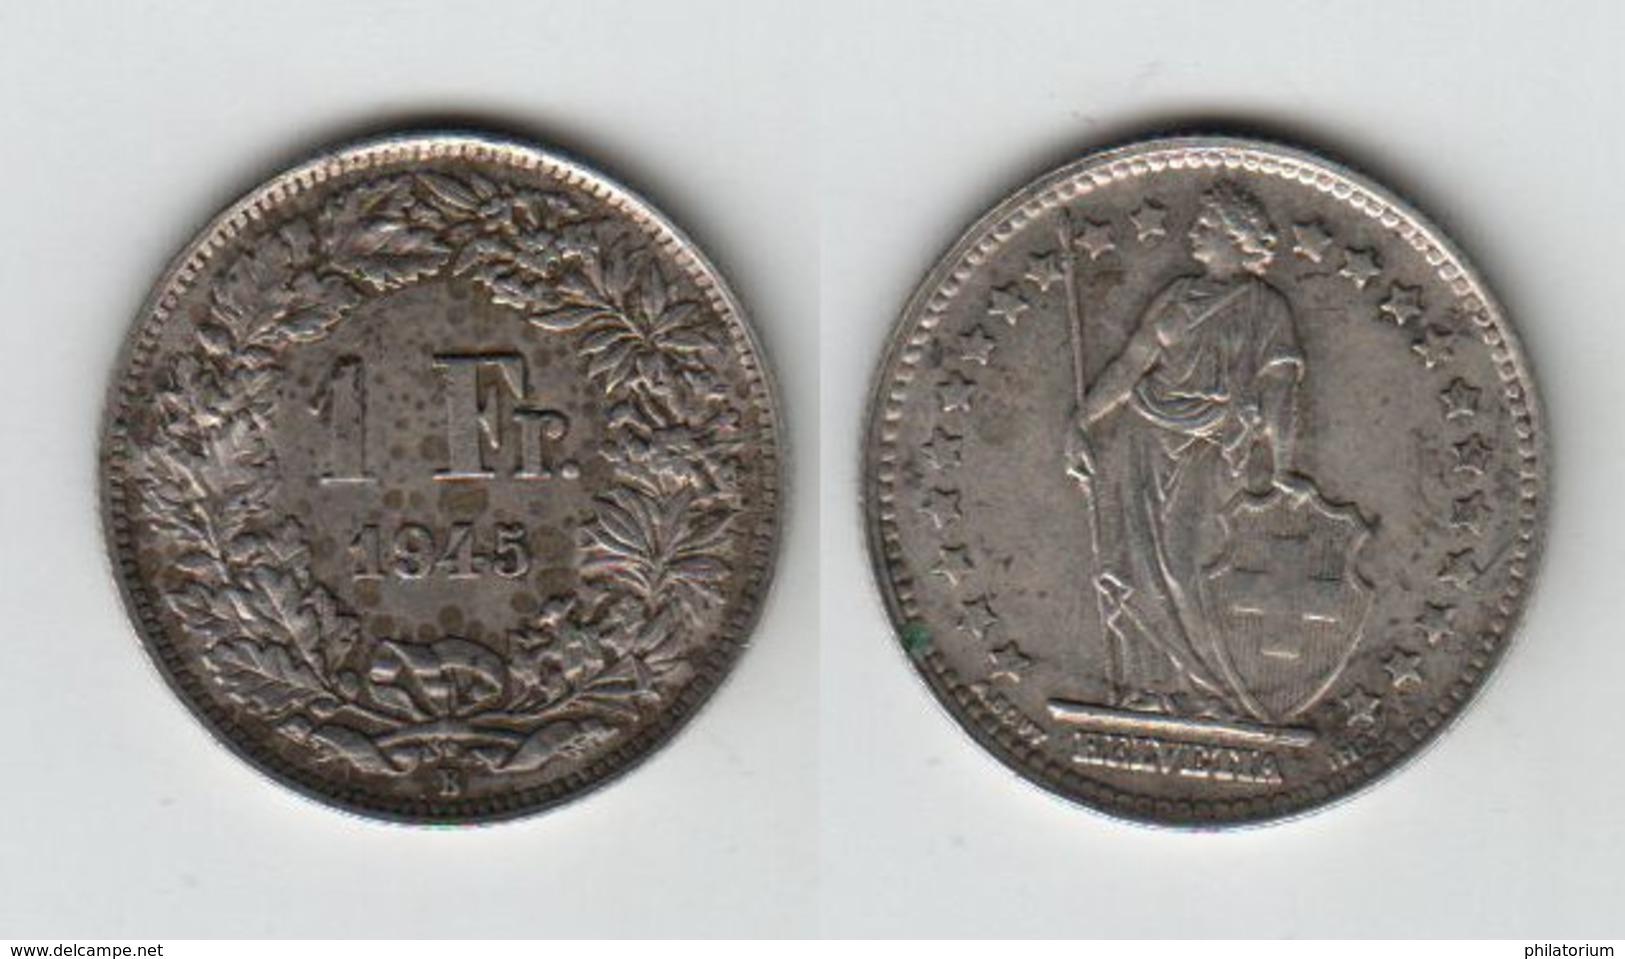 SUISSE 1 Franc 1945  1Fr - Schweiz